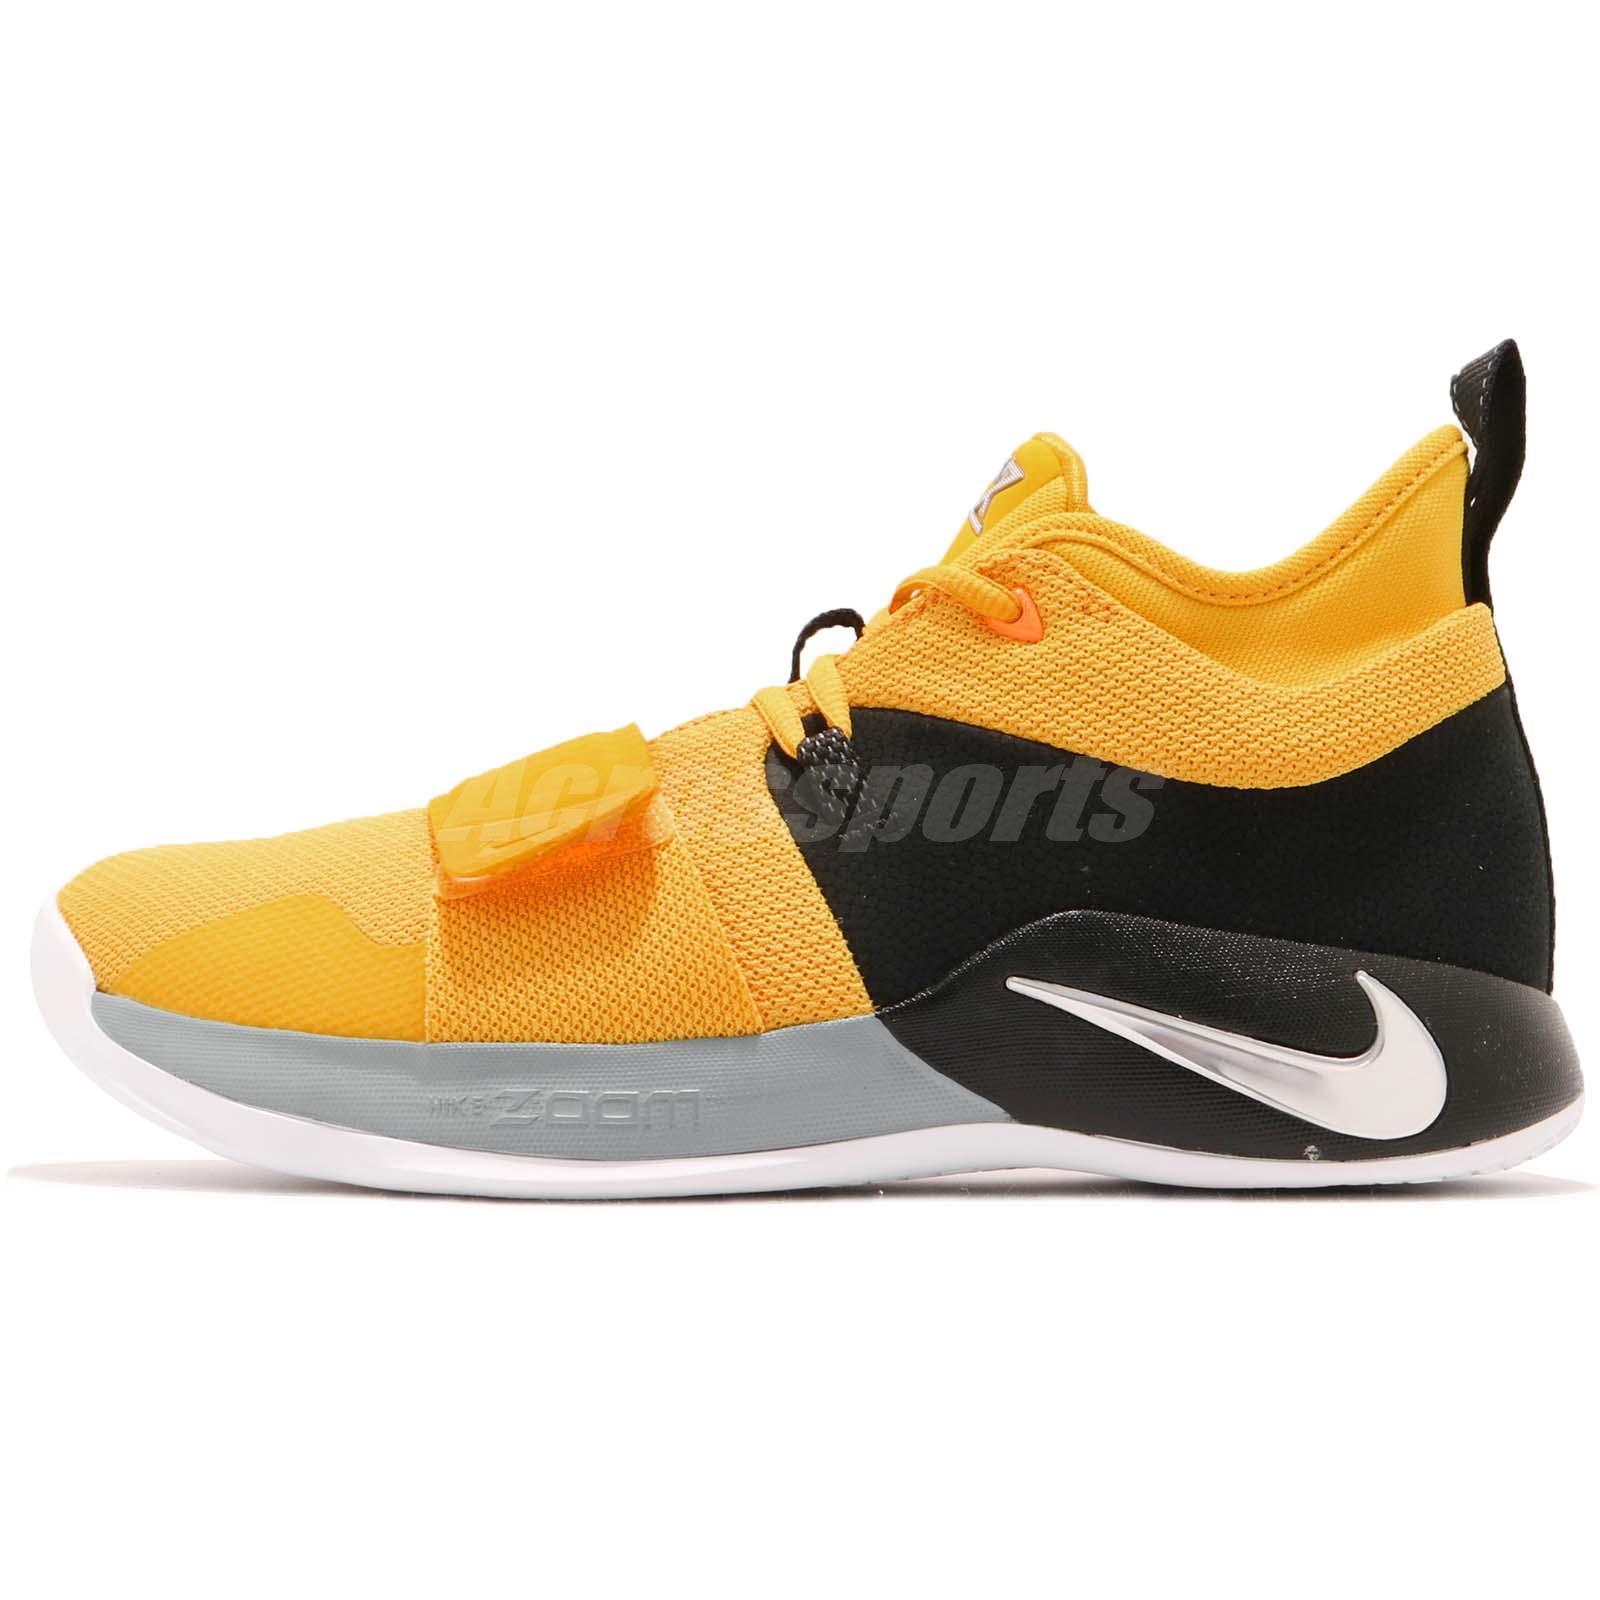 0581adabca81a7 Nike PG 2.5 EP Paul George Moon Exploration Amarillo Yellow Men Shoes  BQ8453-700